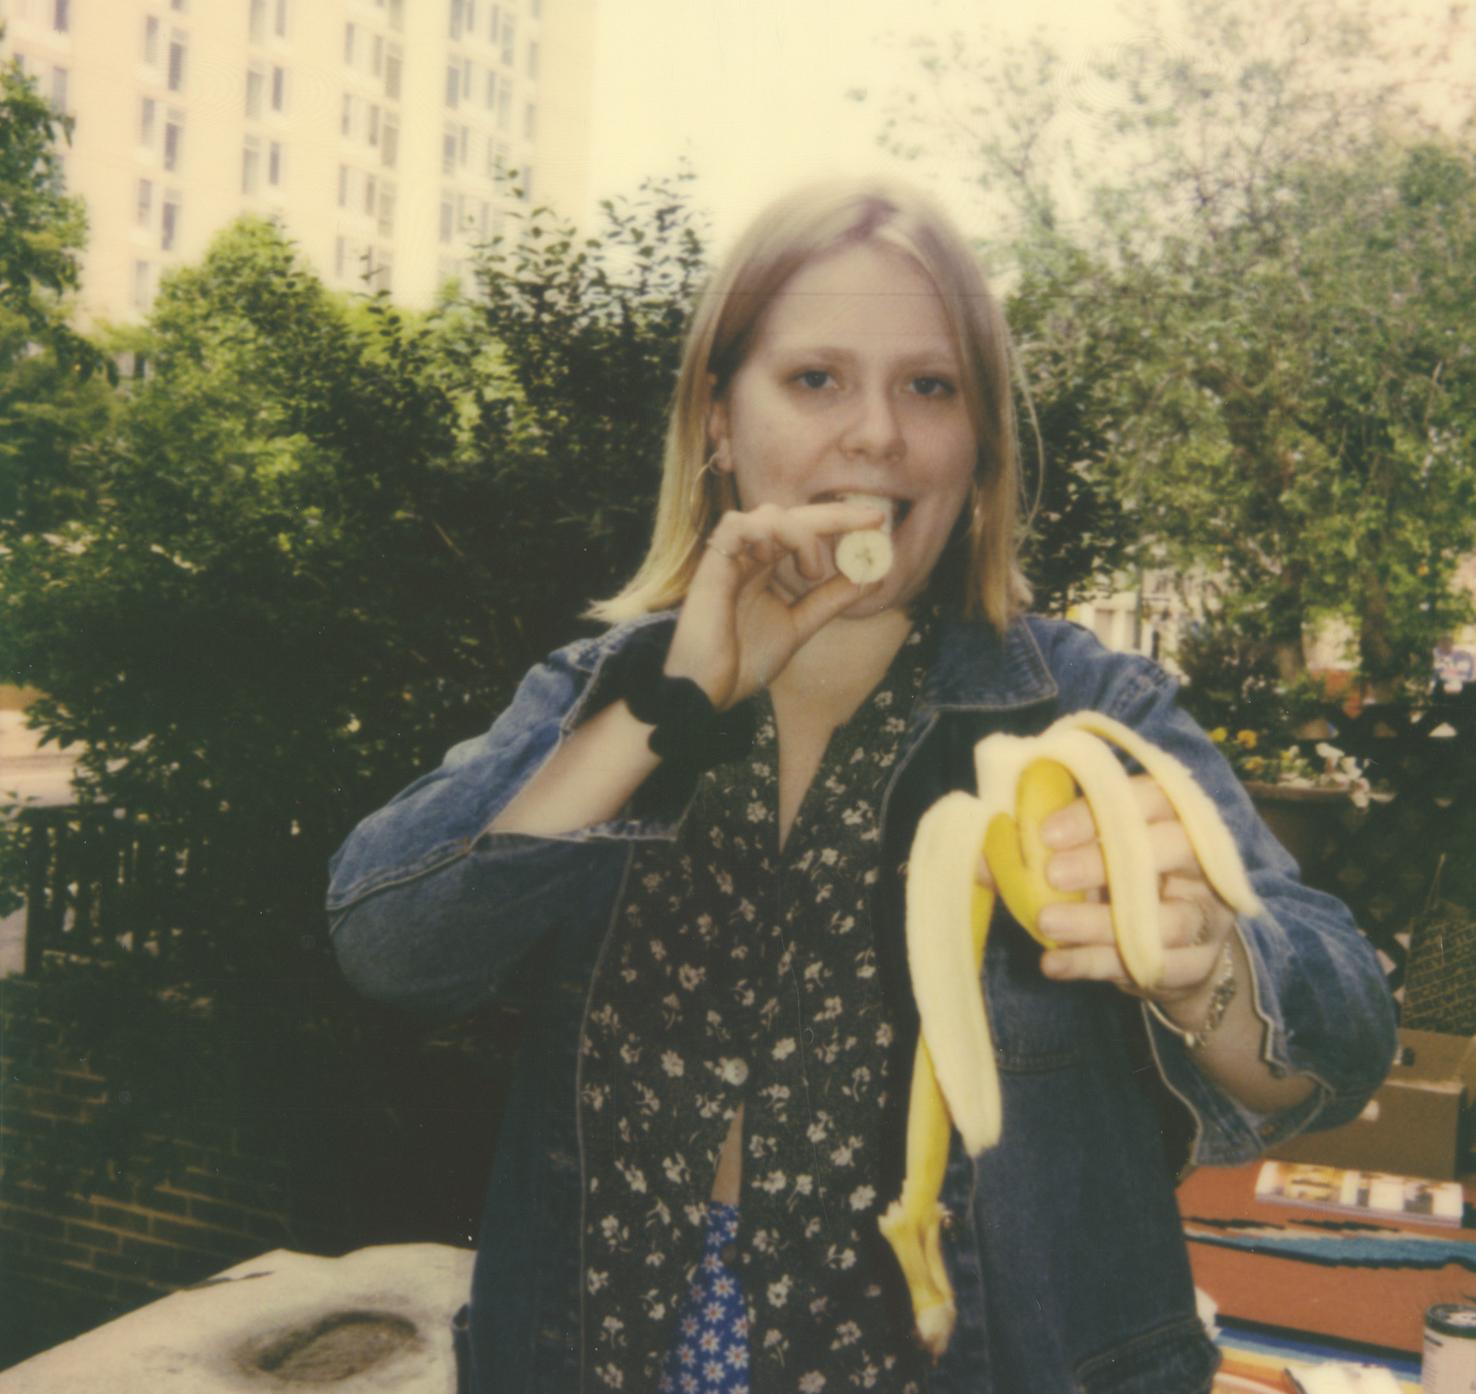 Sofie Praestgaard's Bubbling Beats